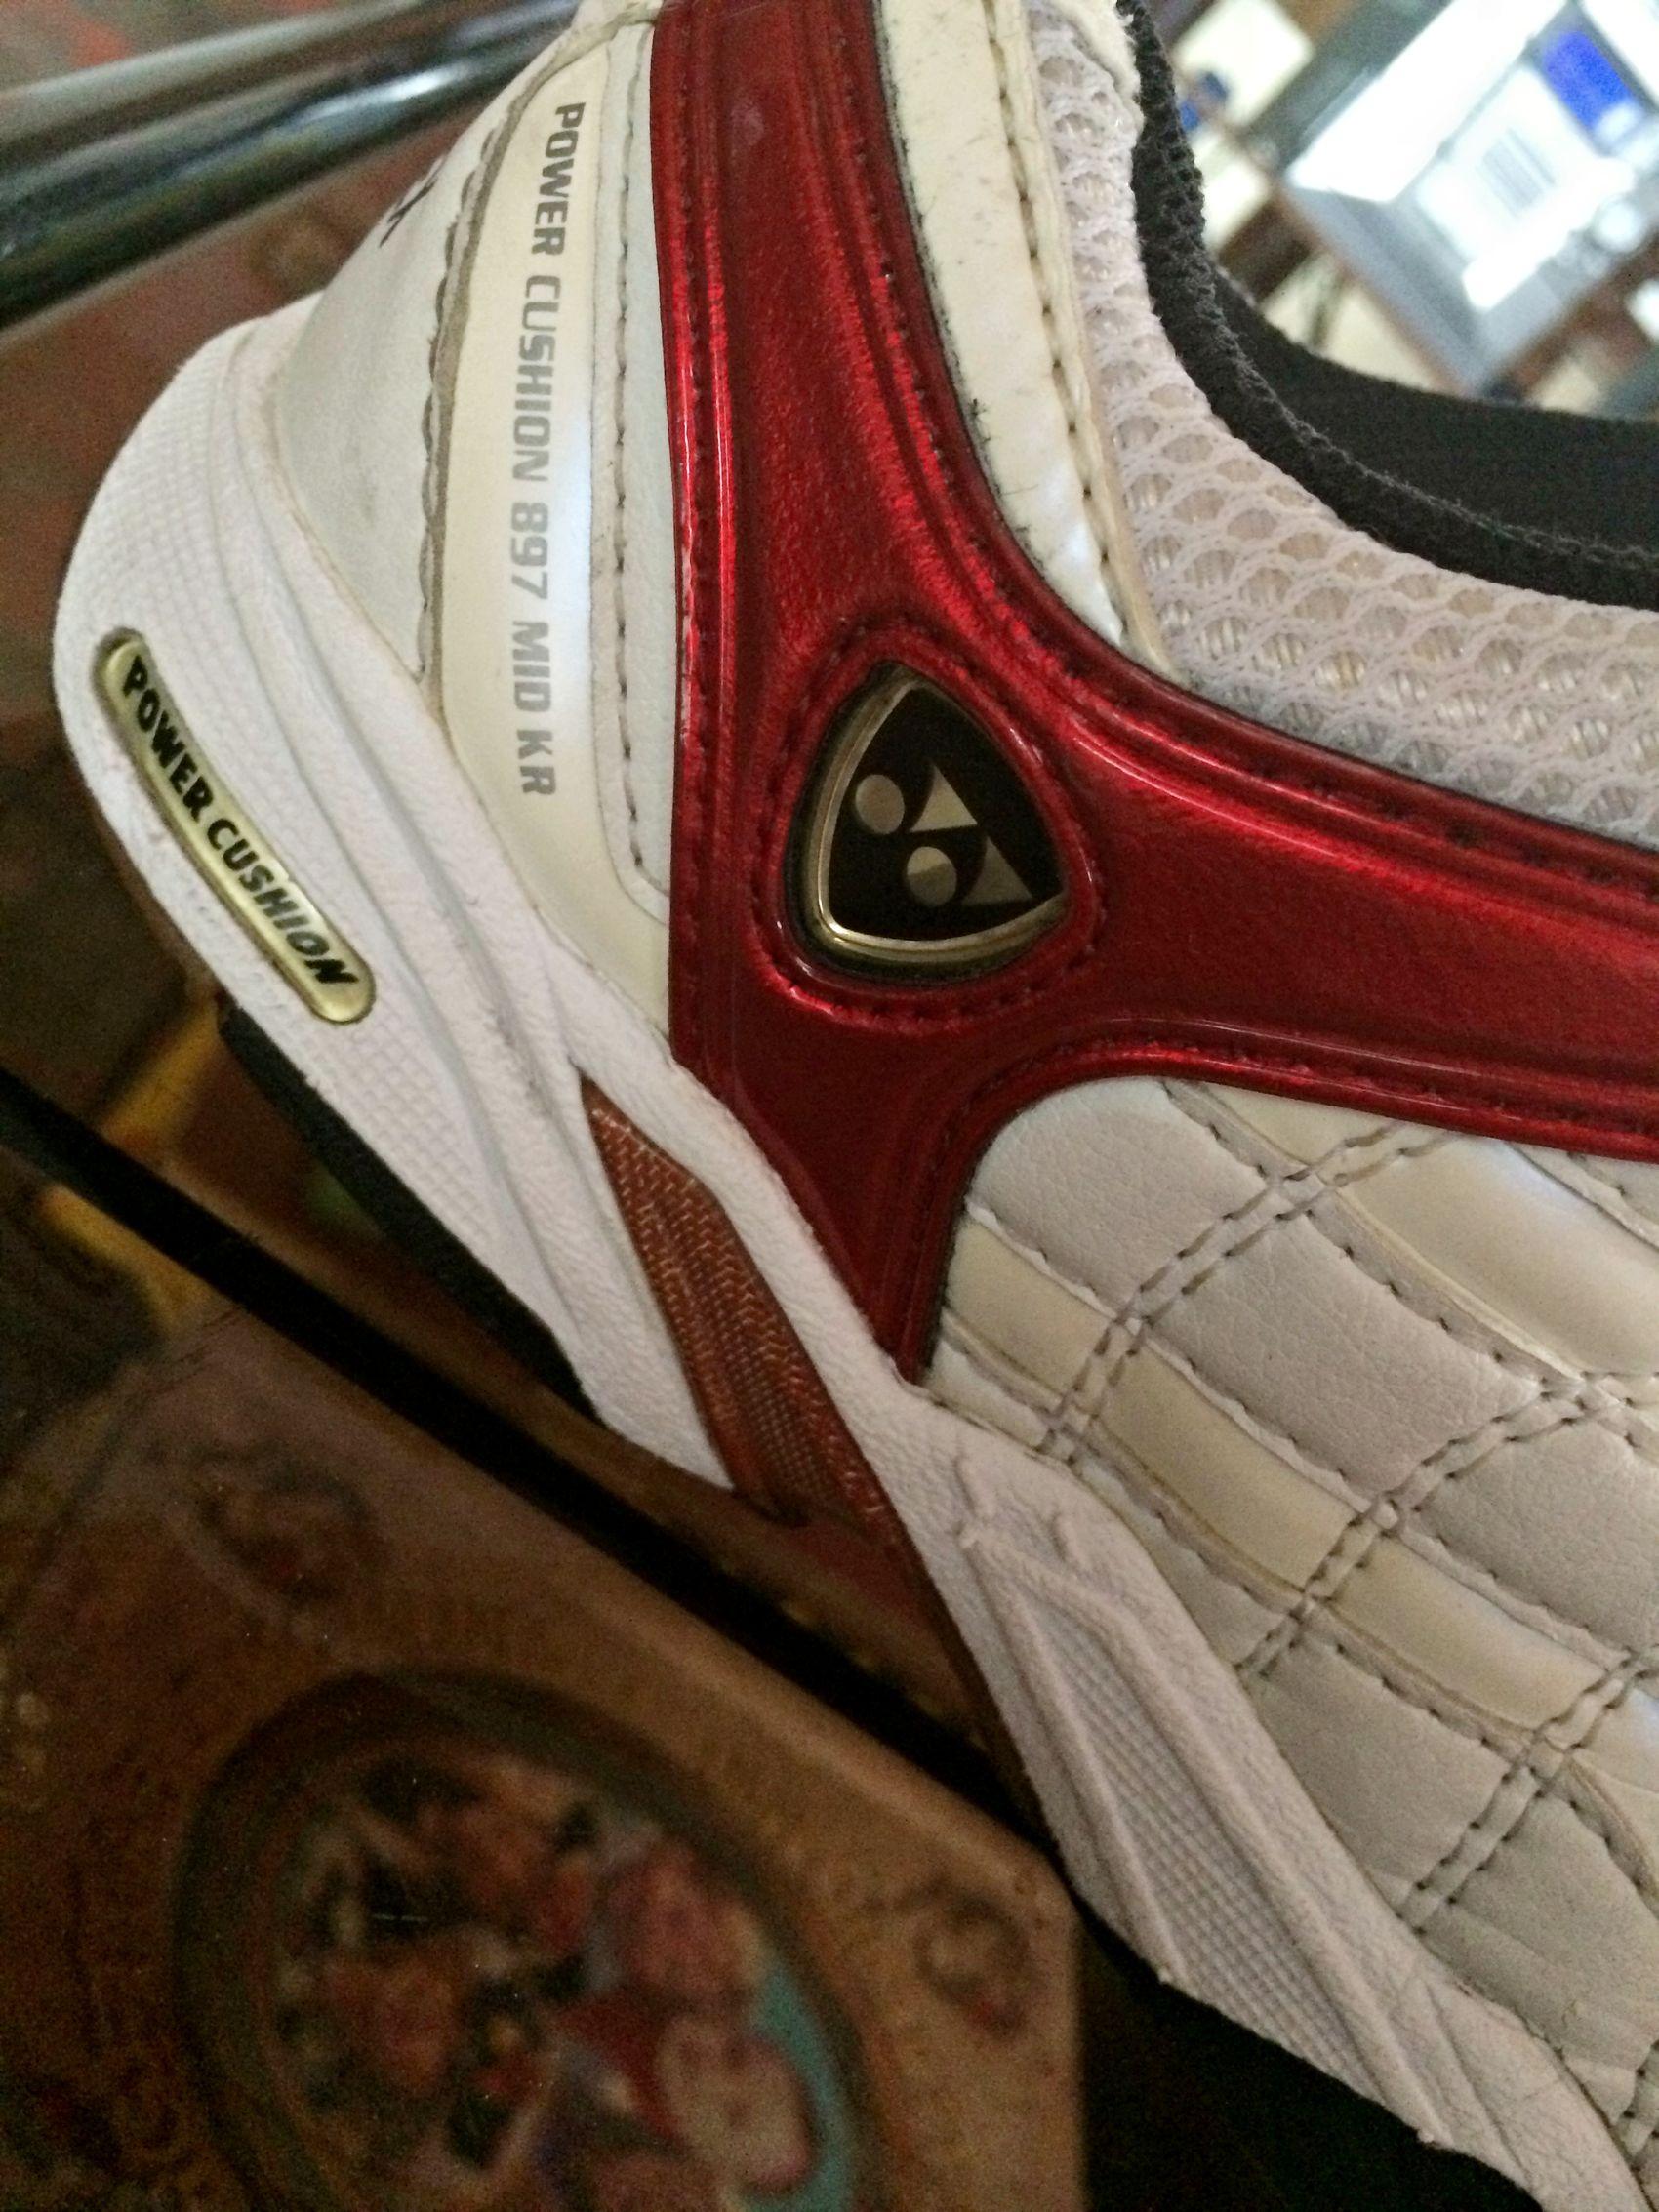 Birthay gift. Badminton Shoes Yonex